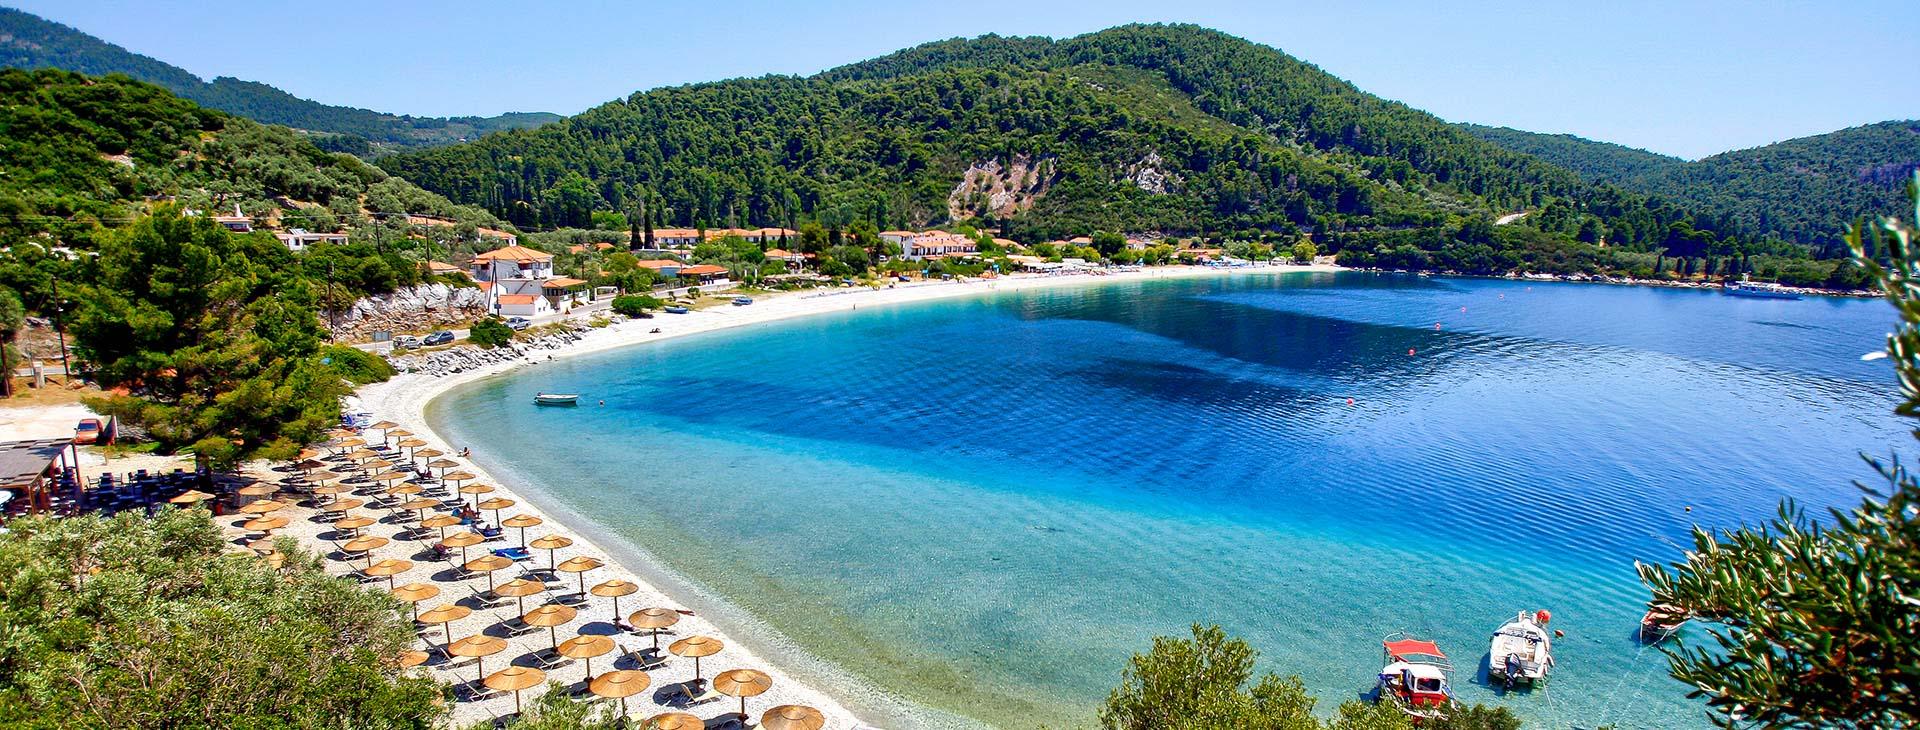 Hotel Blue Green Bay 4* • Skopelos